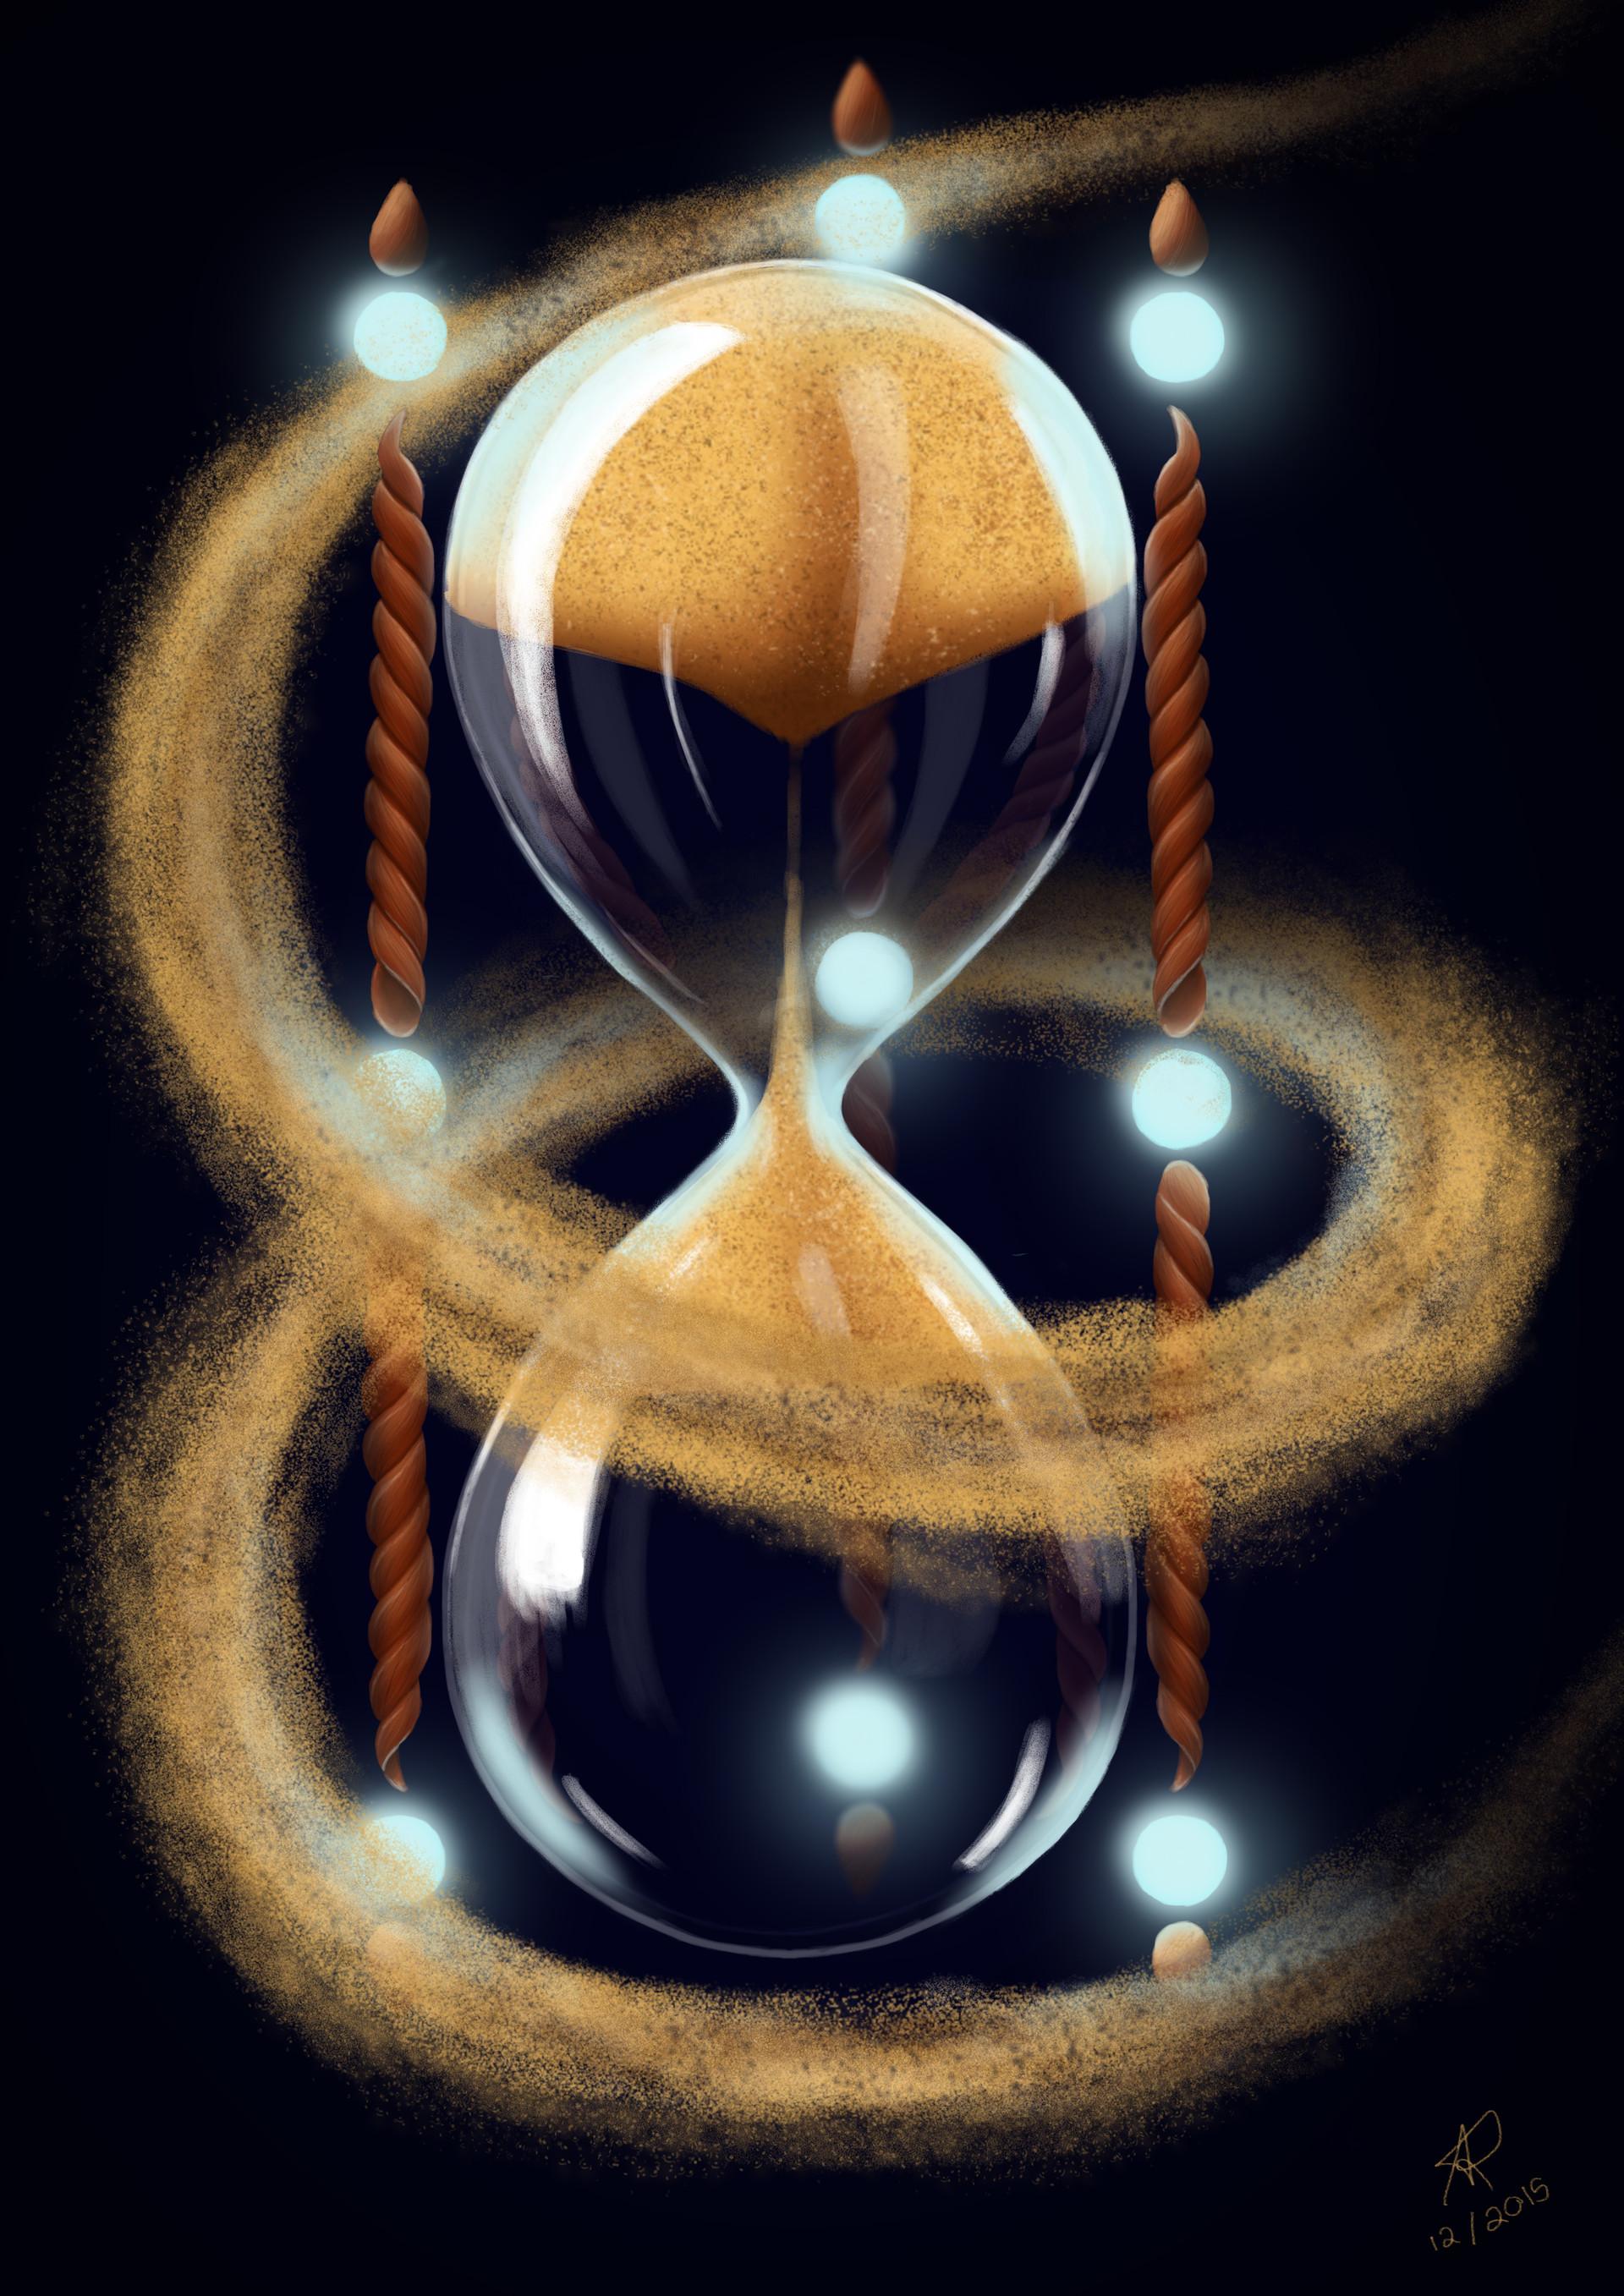 Digi nana hourglass